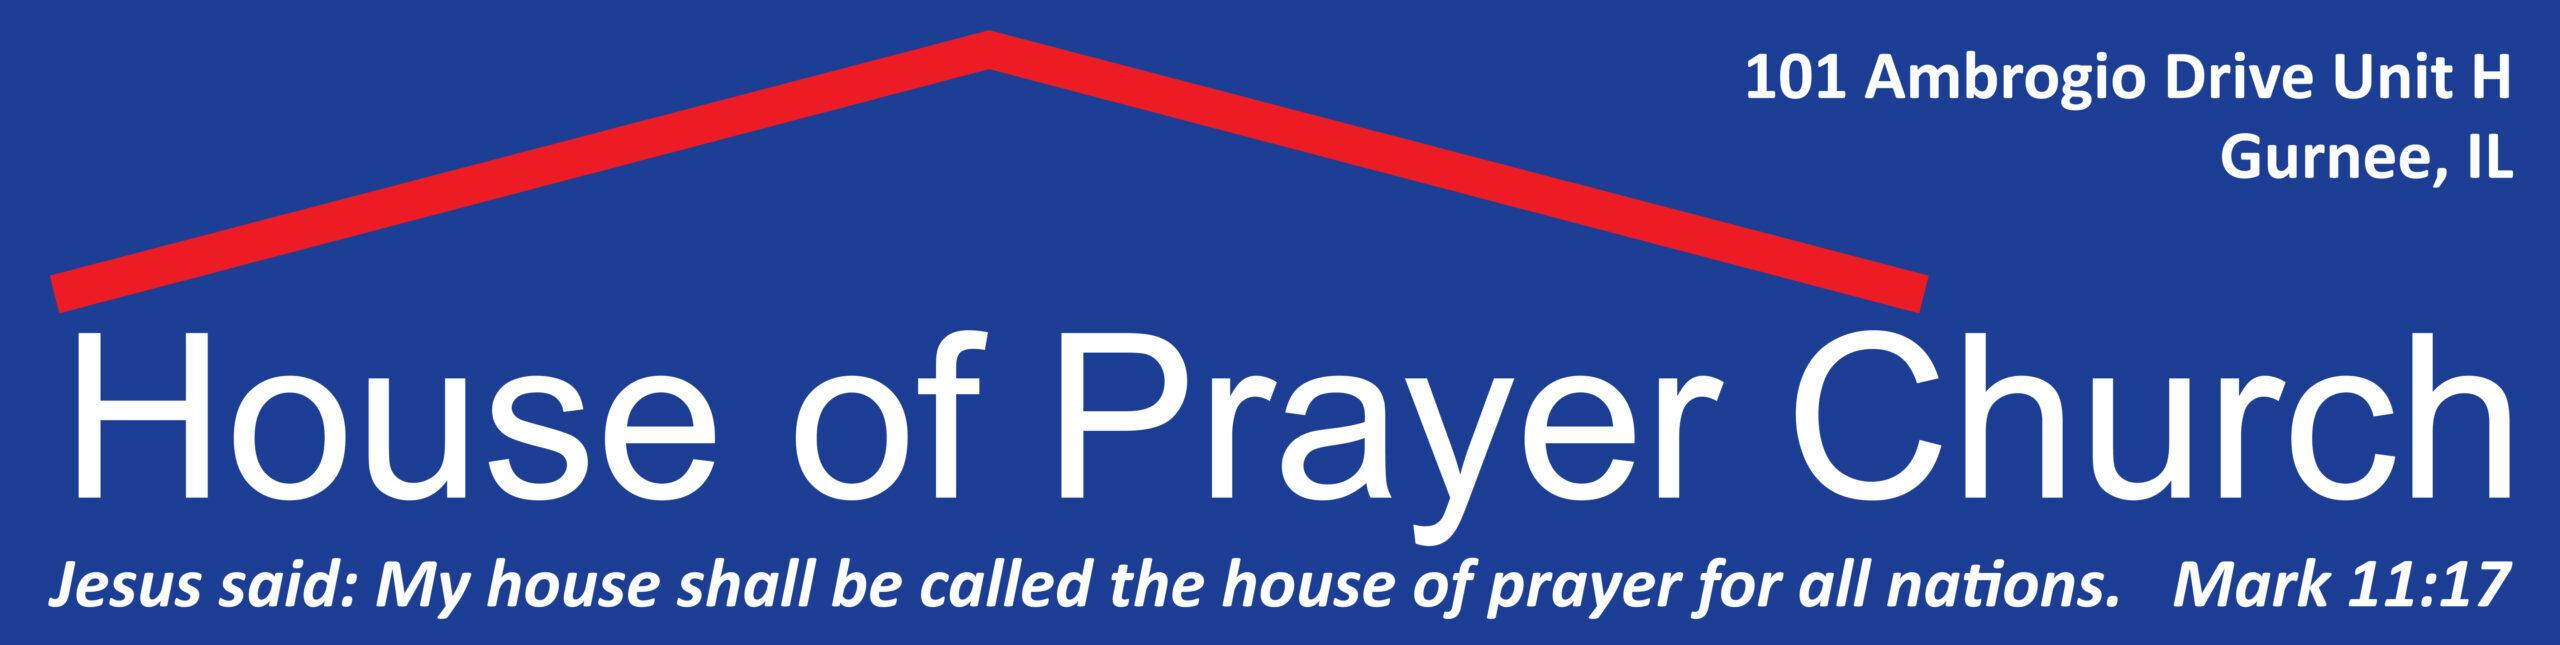 House of Prayer  Church Gurnee